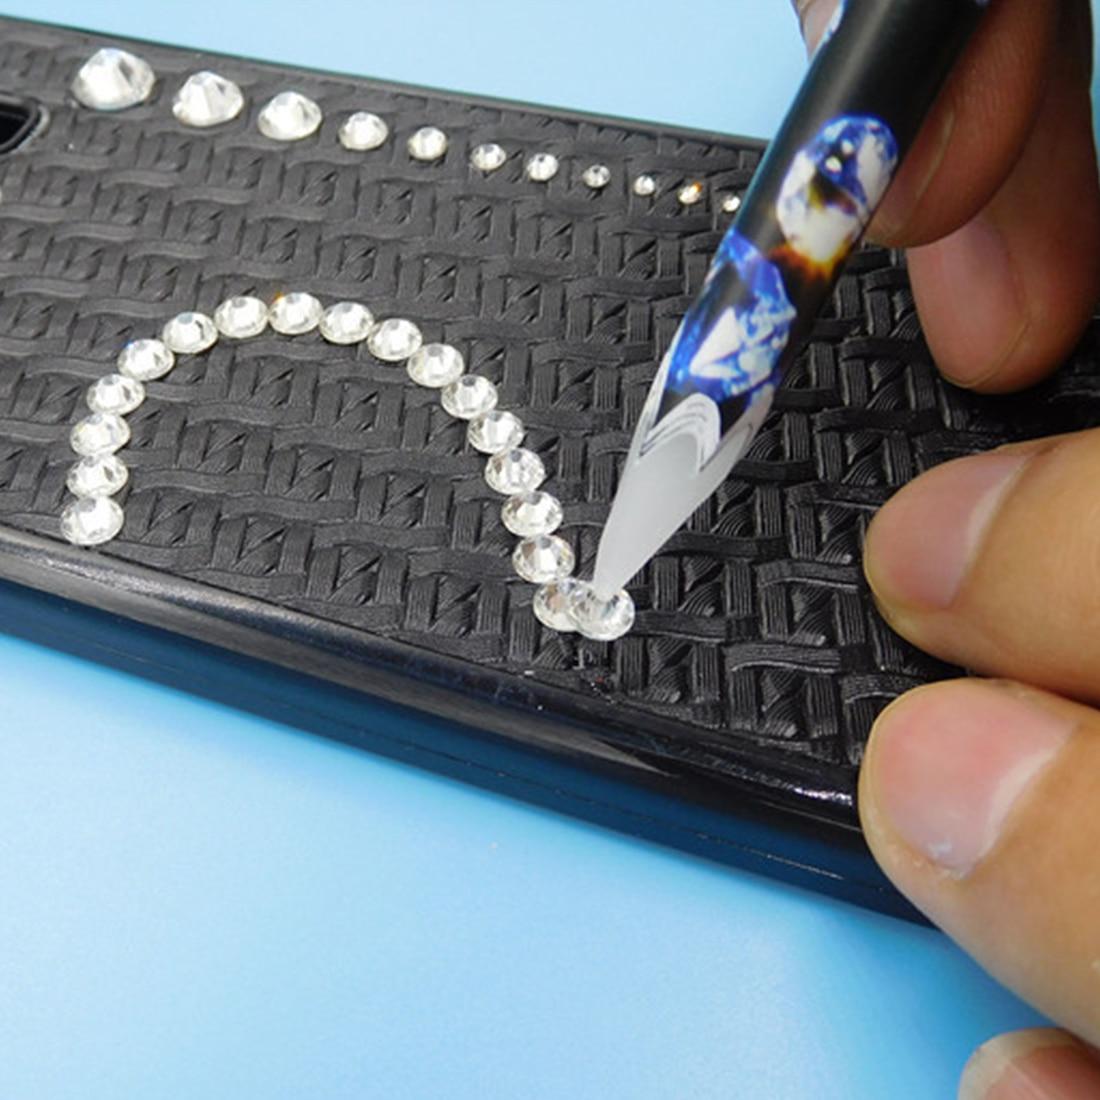 3D Nail Decoration Tool Wax Pen Rhinestone Studs Picker Crystal Easily Picking Up Pencil 1PC Nail Art Manicure Dotting Pen